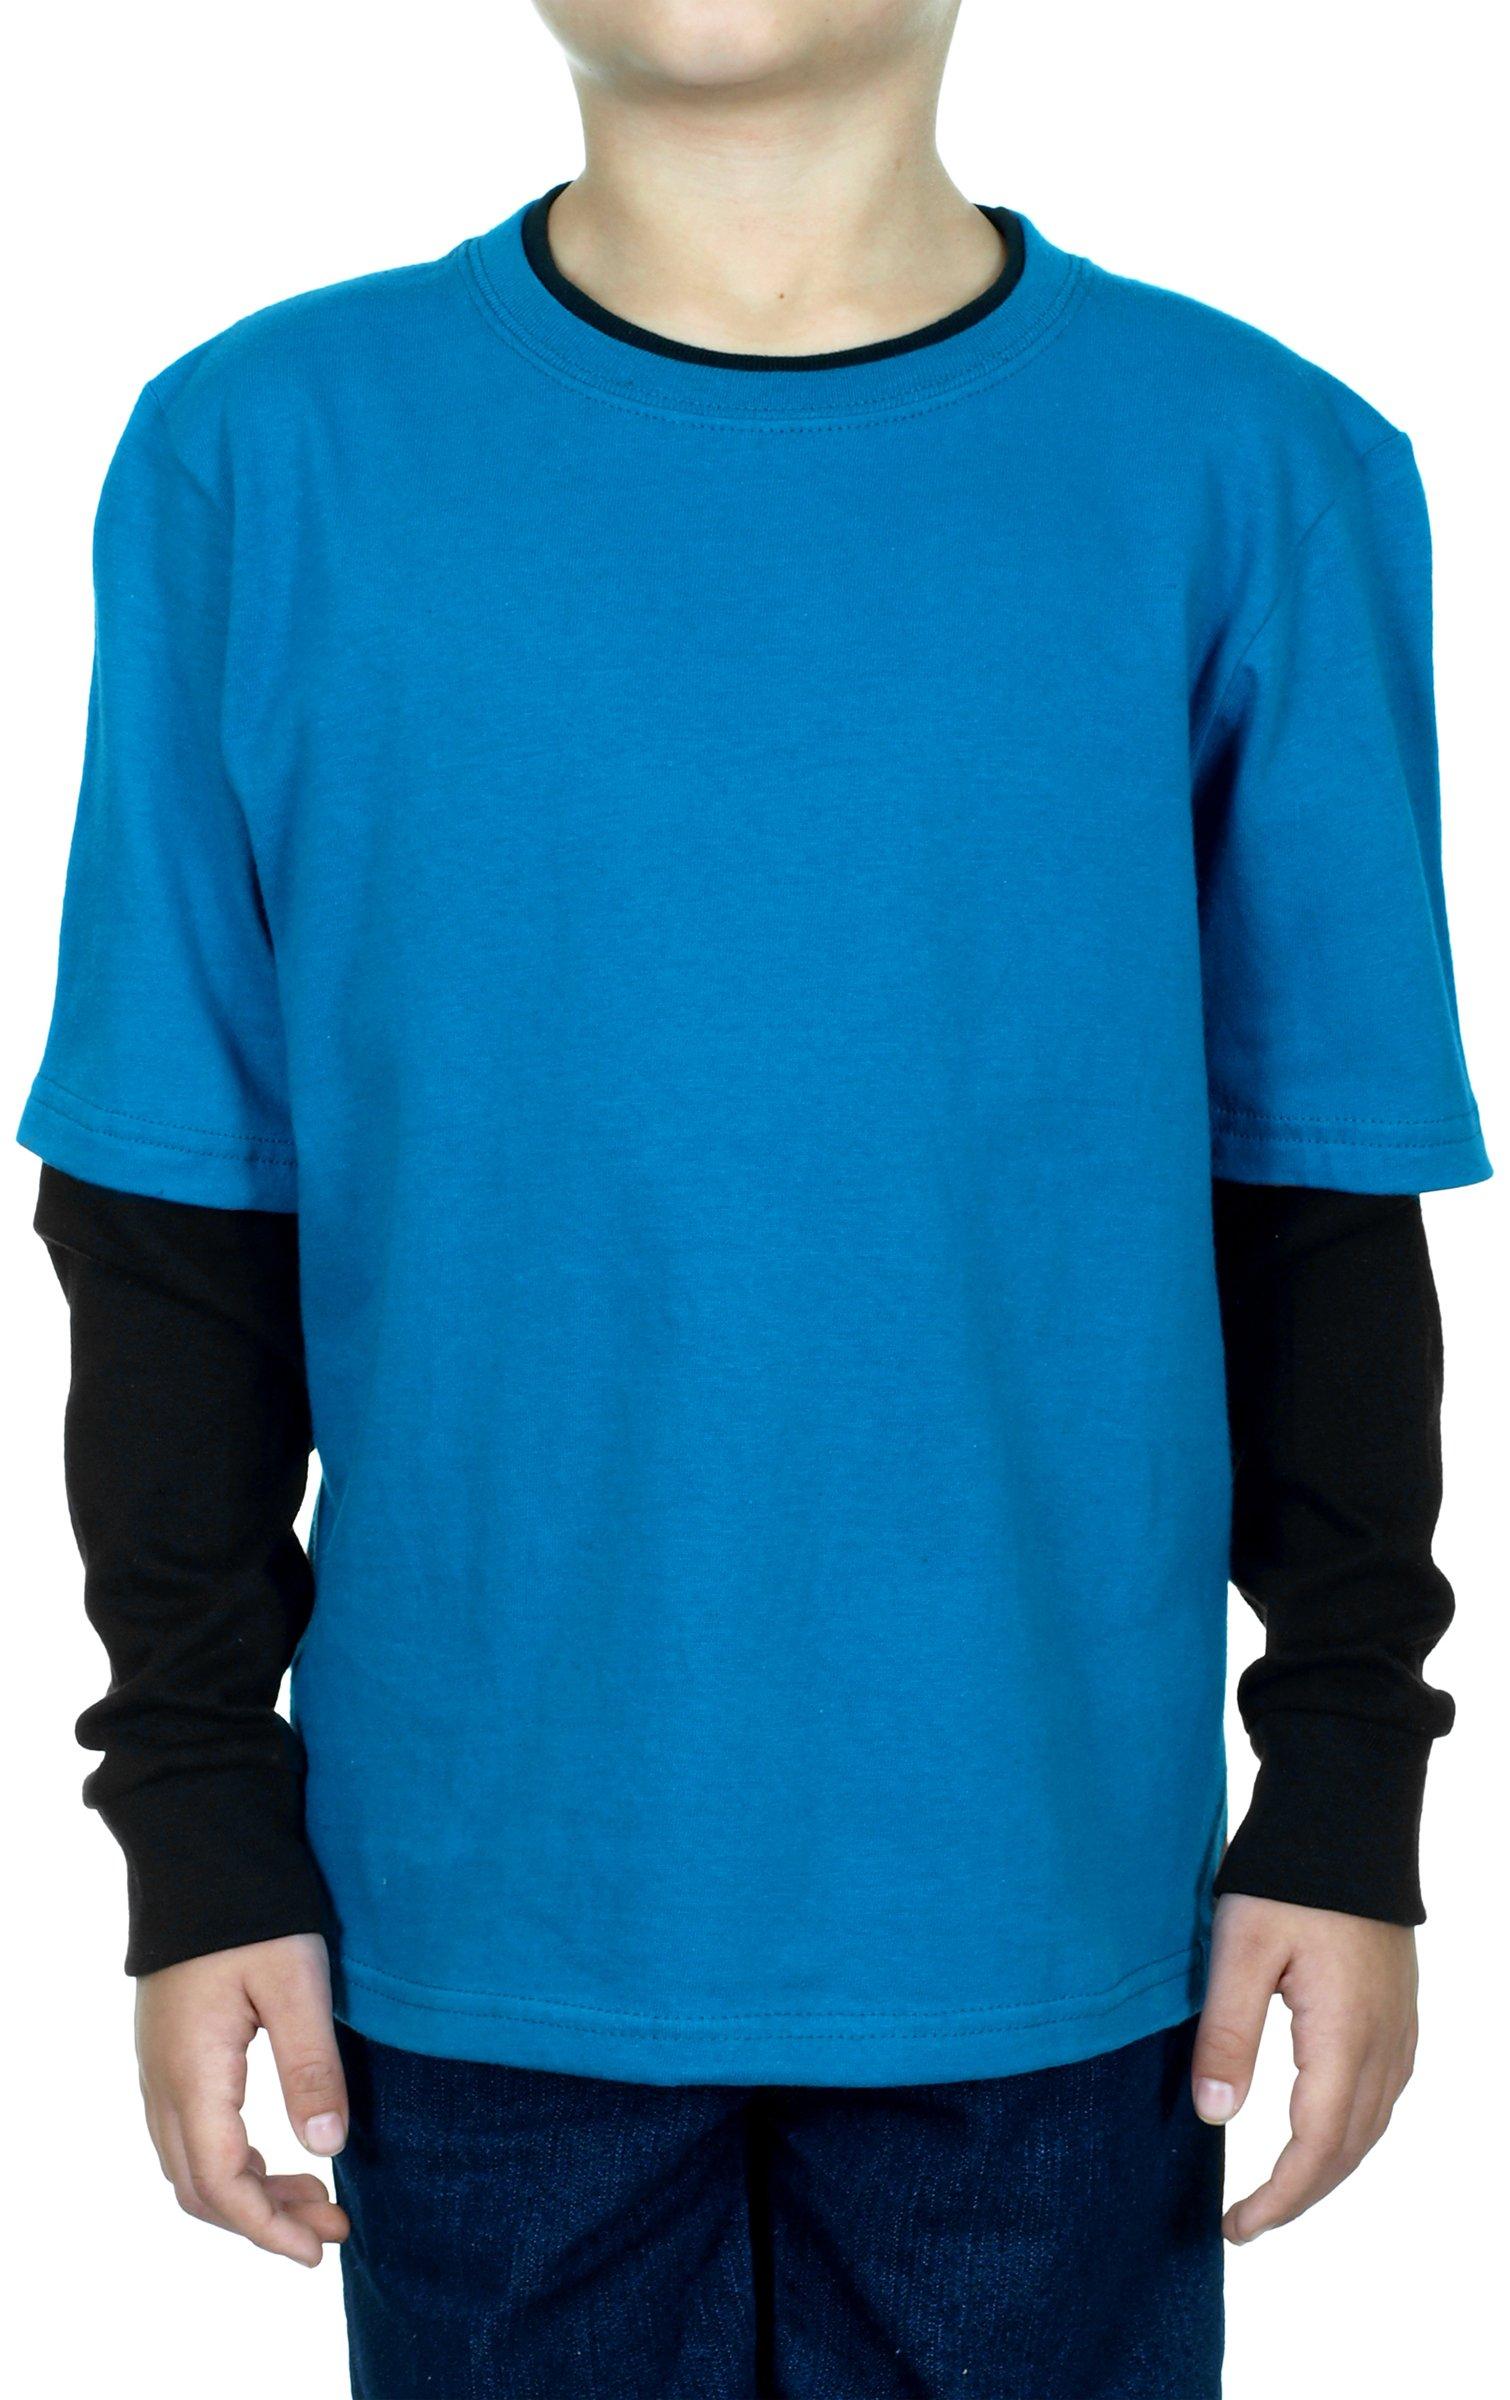 Layered Boy's Long Sleeve T-Shirt Two-Fer Shirt Teal & Black(7X, Teal & Black)